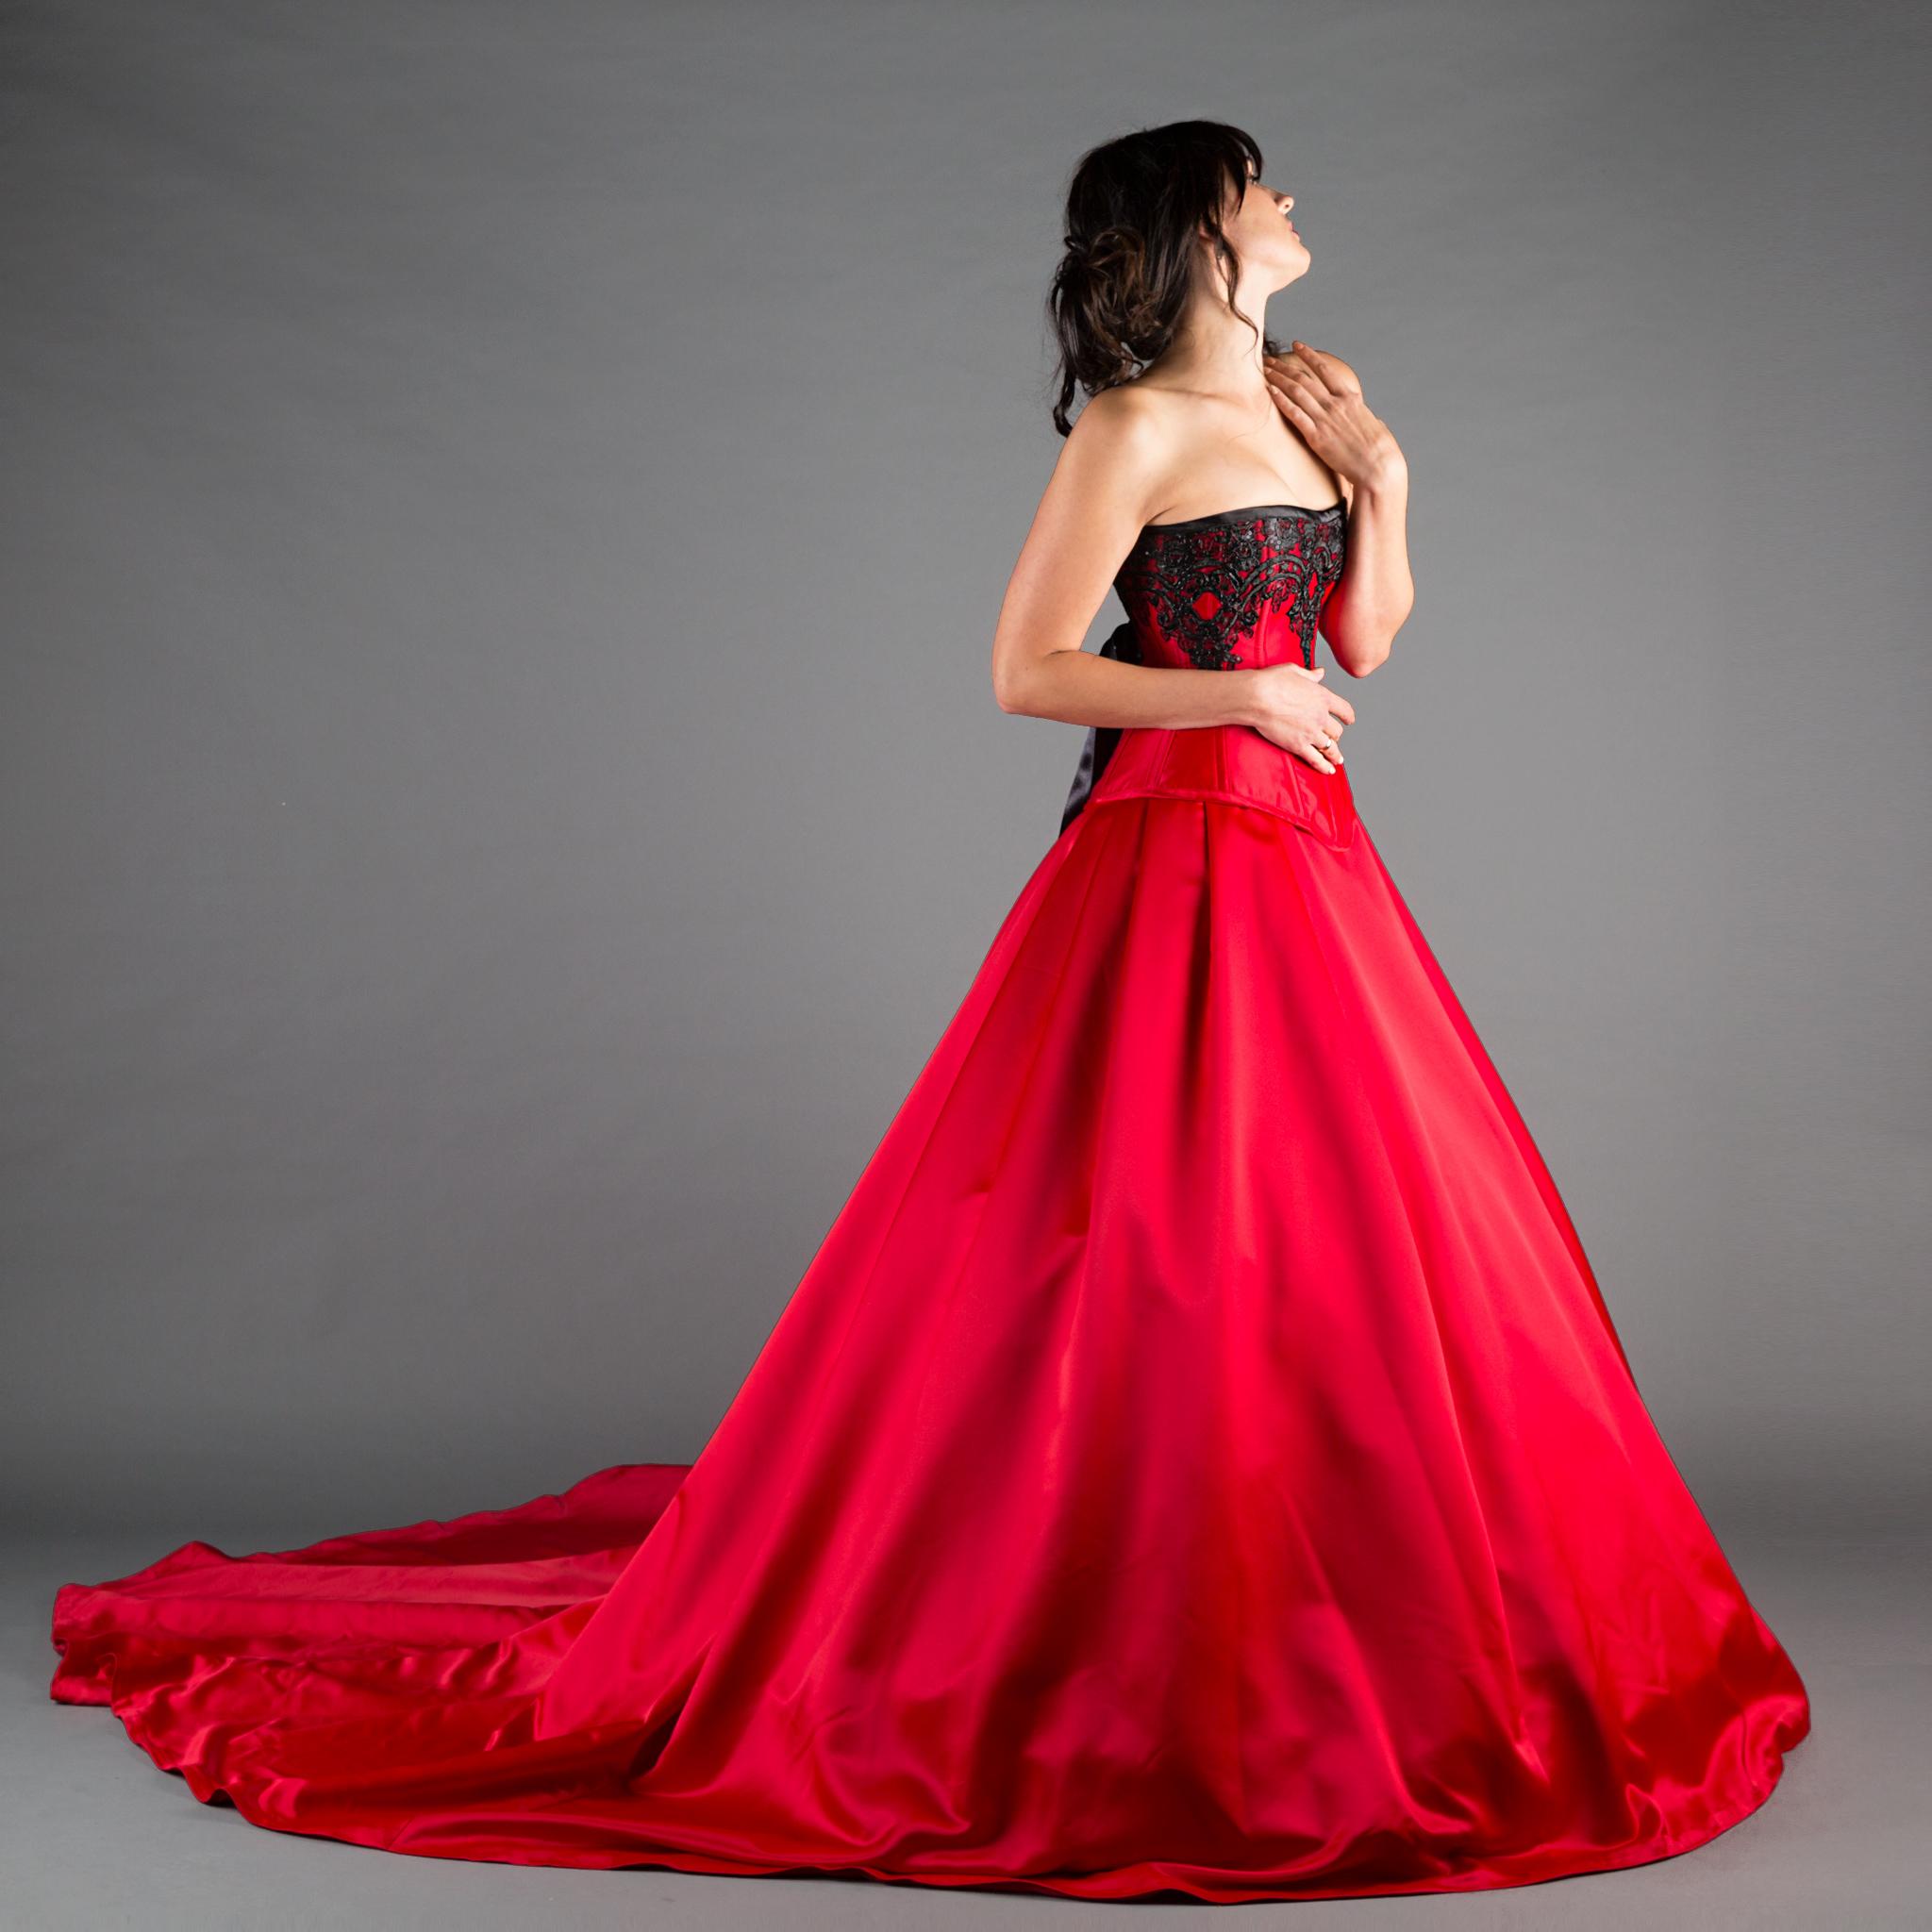 919d67bb7 Medieval, Vintage & Gothic Wedding Dresses | Matrimony Prep